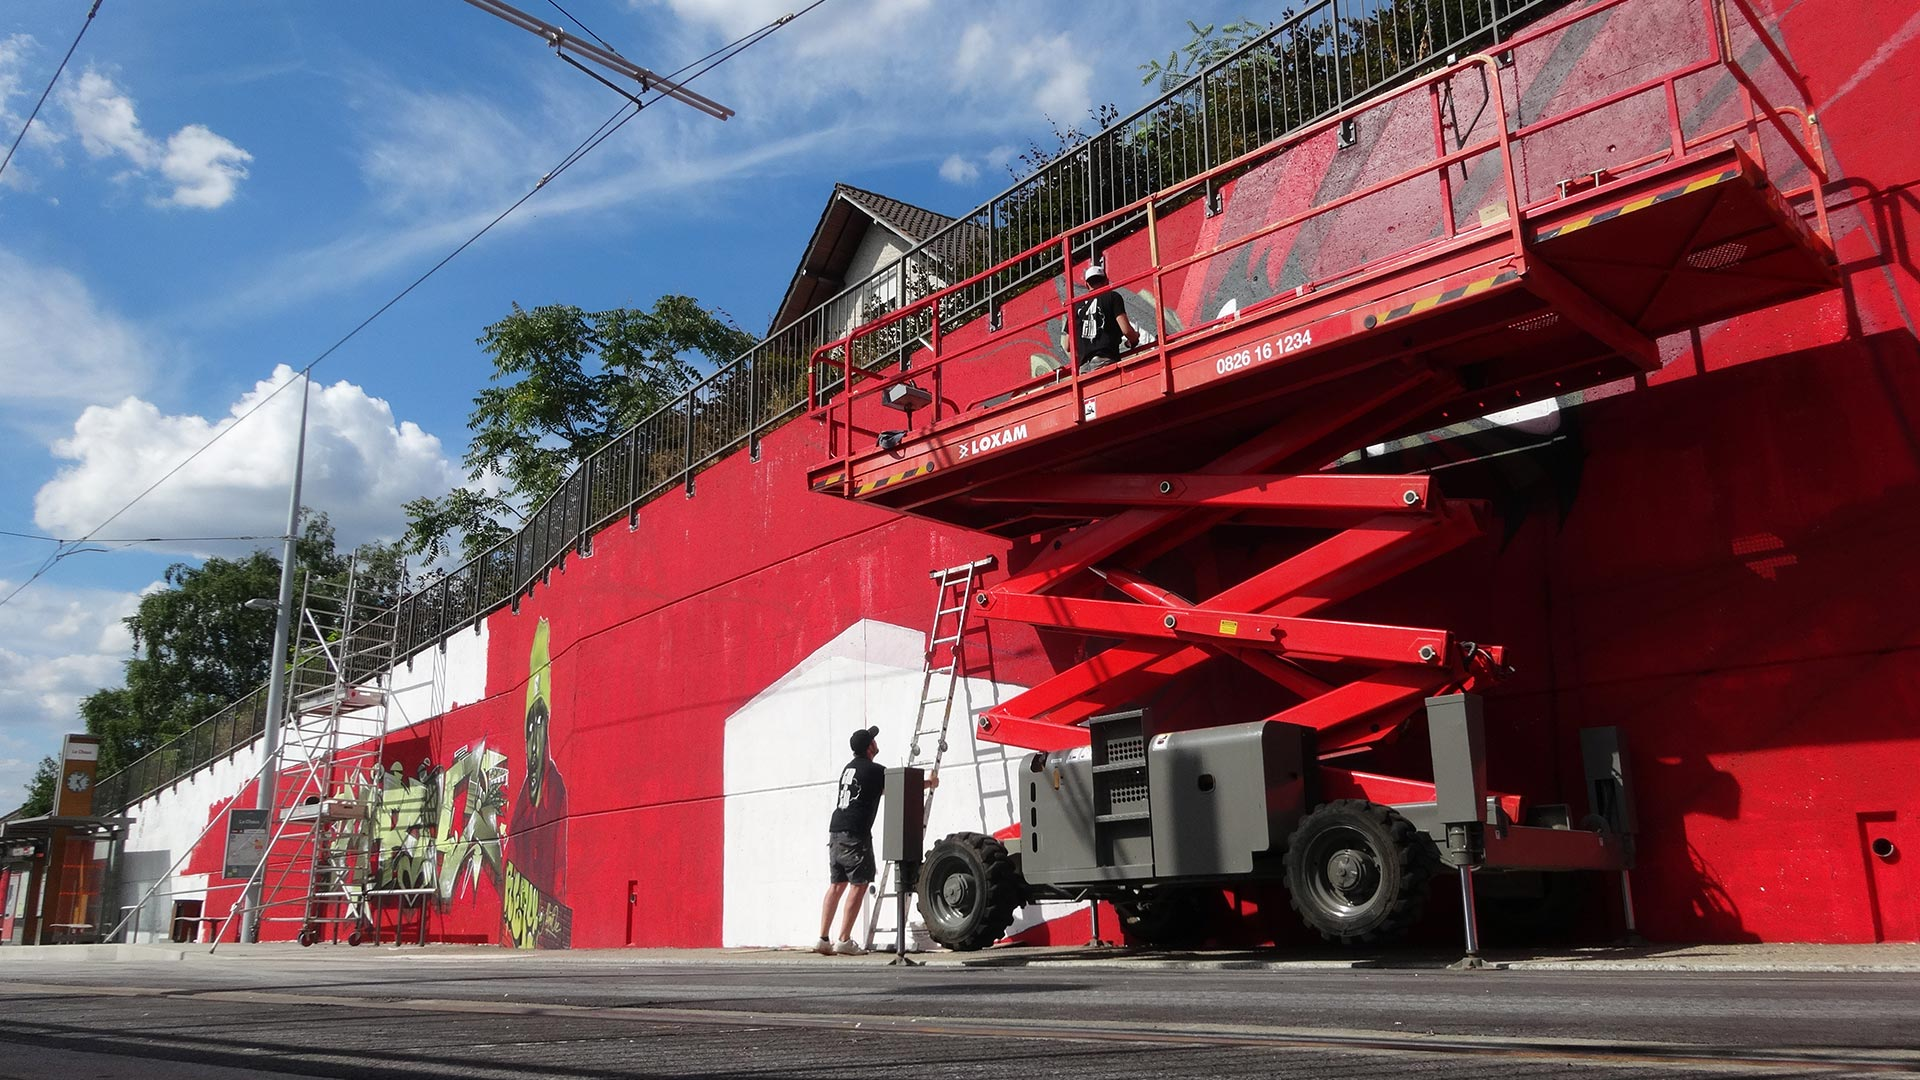 Clermont Urban Graff - Trans'urbaines - Clermont-Ferrand